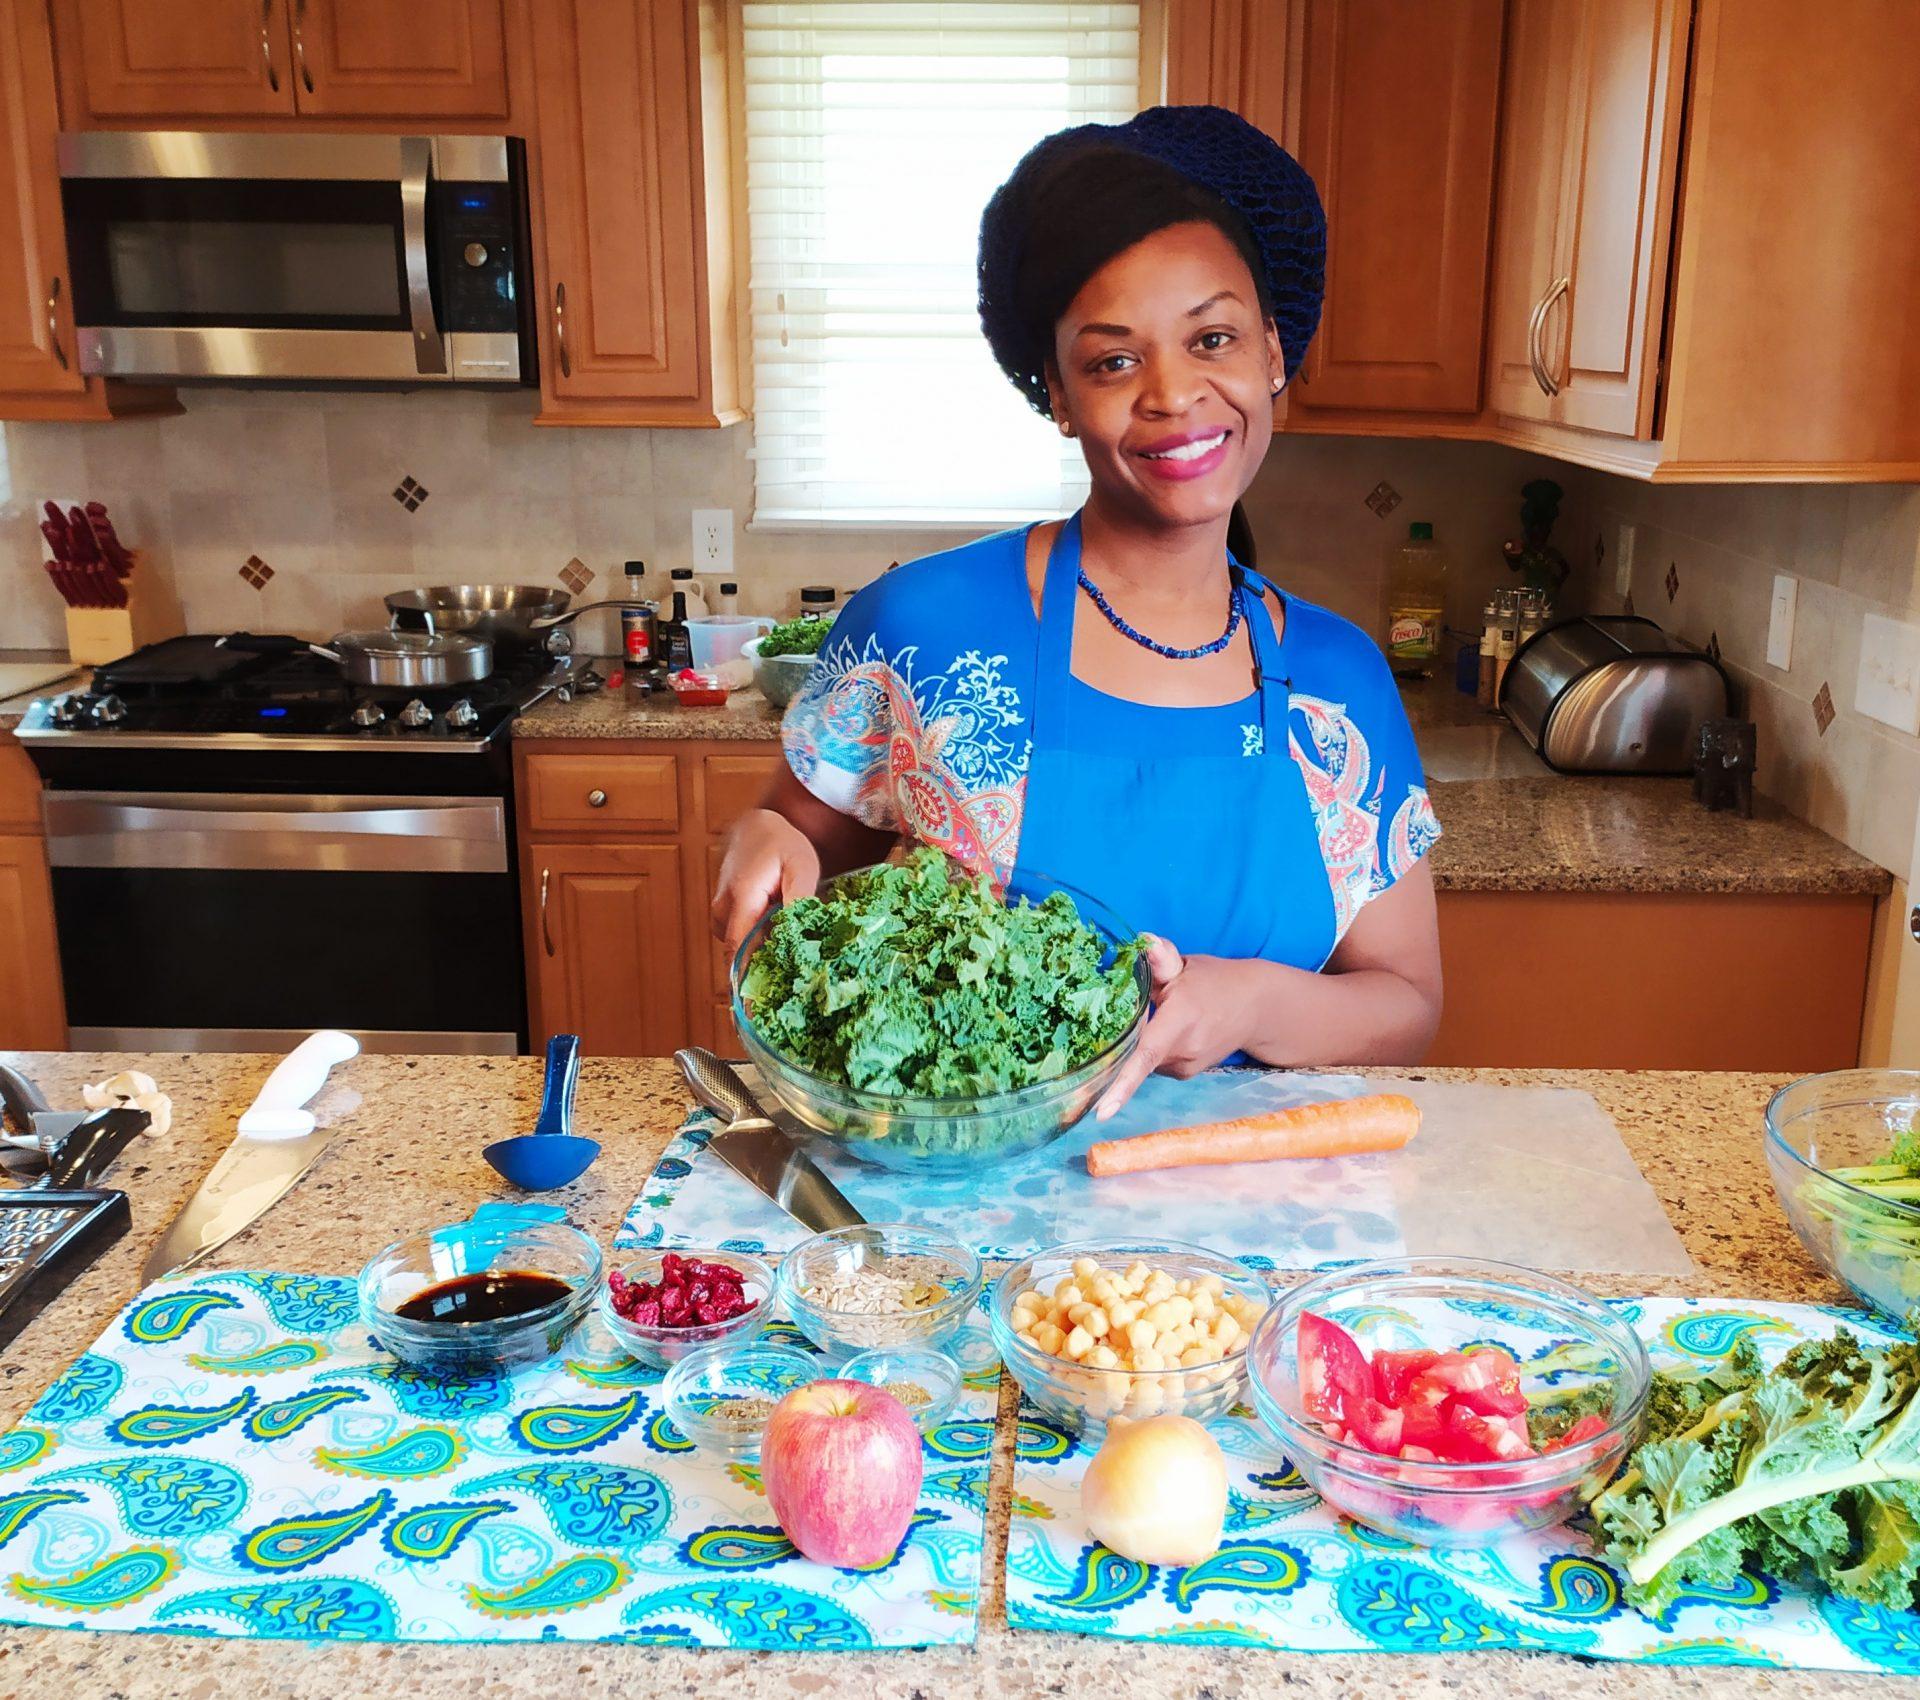 HWH-Meal-Prep-Kale-Edited